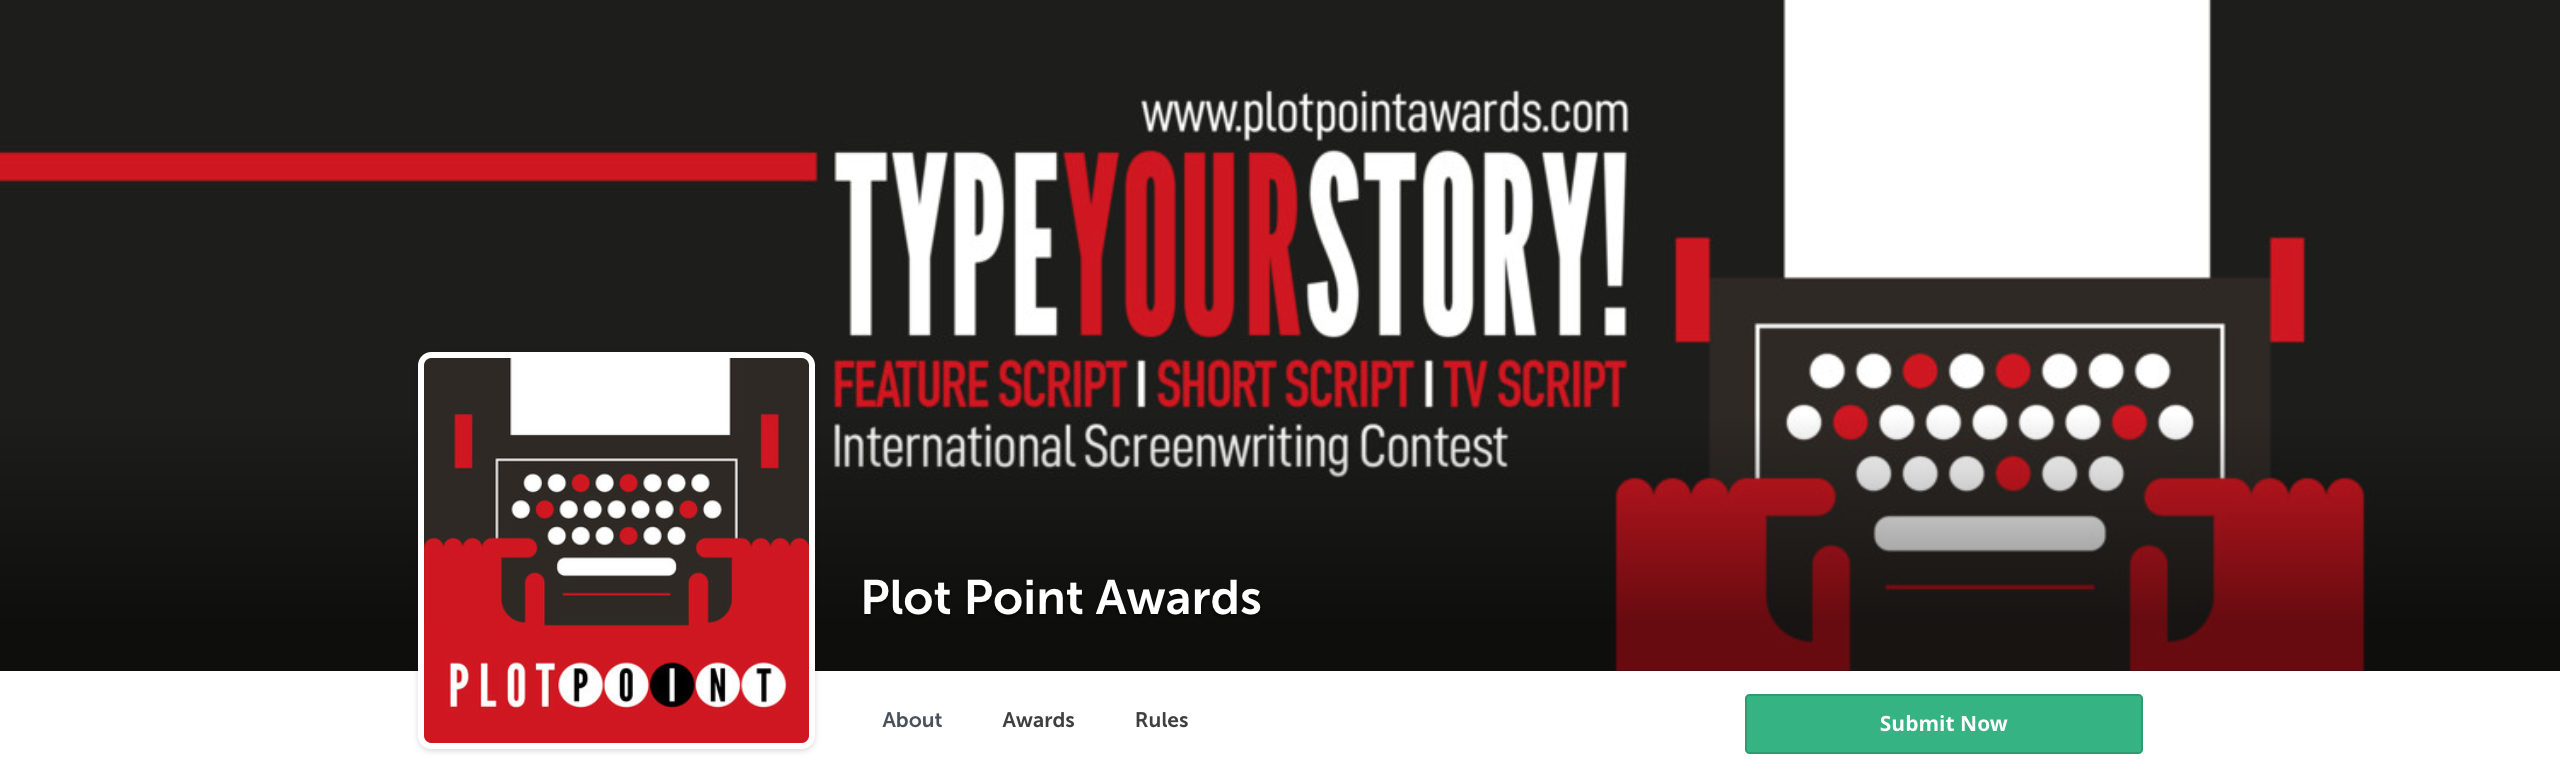 Plot Point Awards